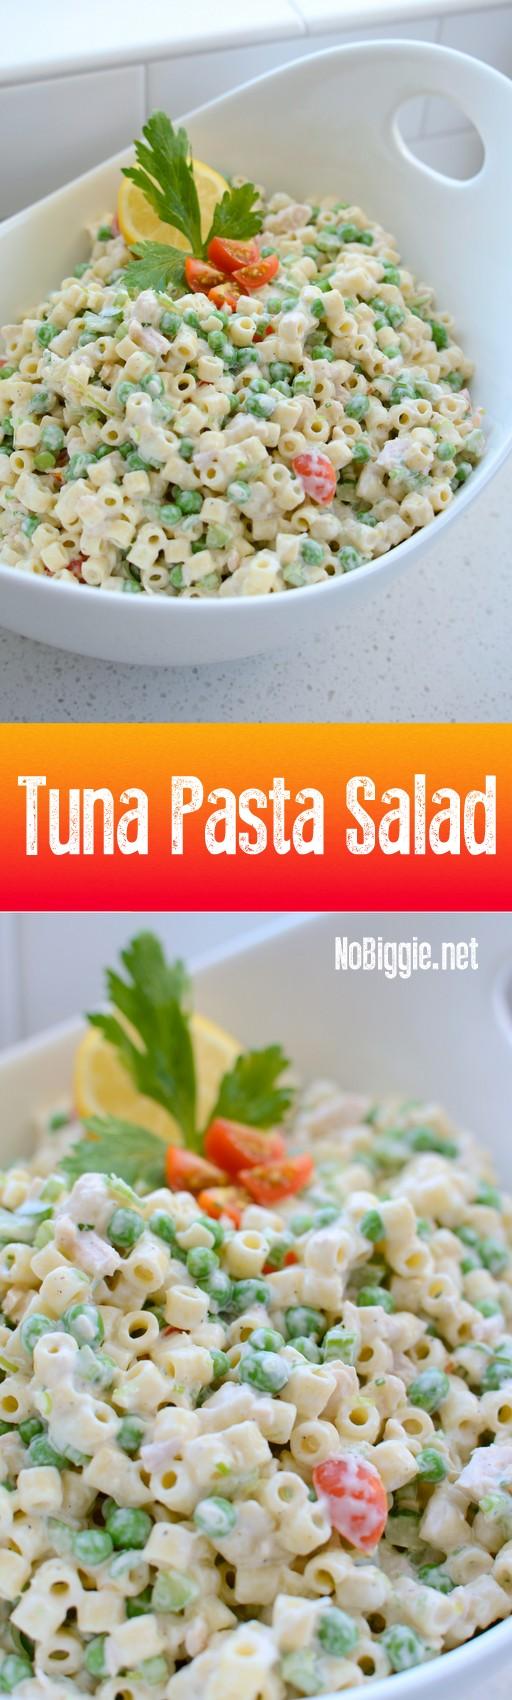 http://www.nobiggie.net/wp-content/uploads/2016/06/Tuna-Pasta-Salad.jpg